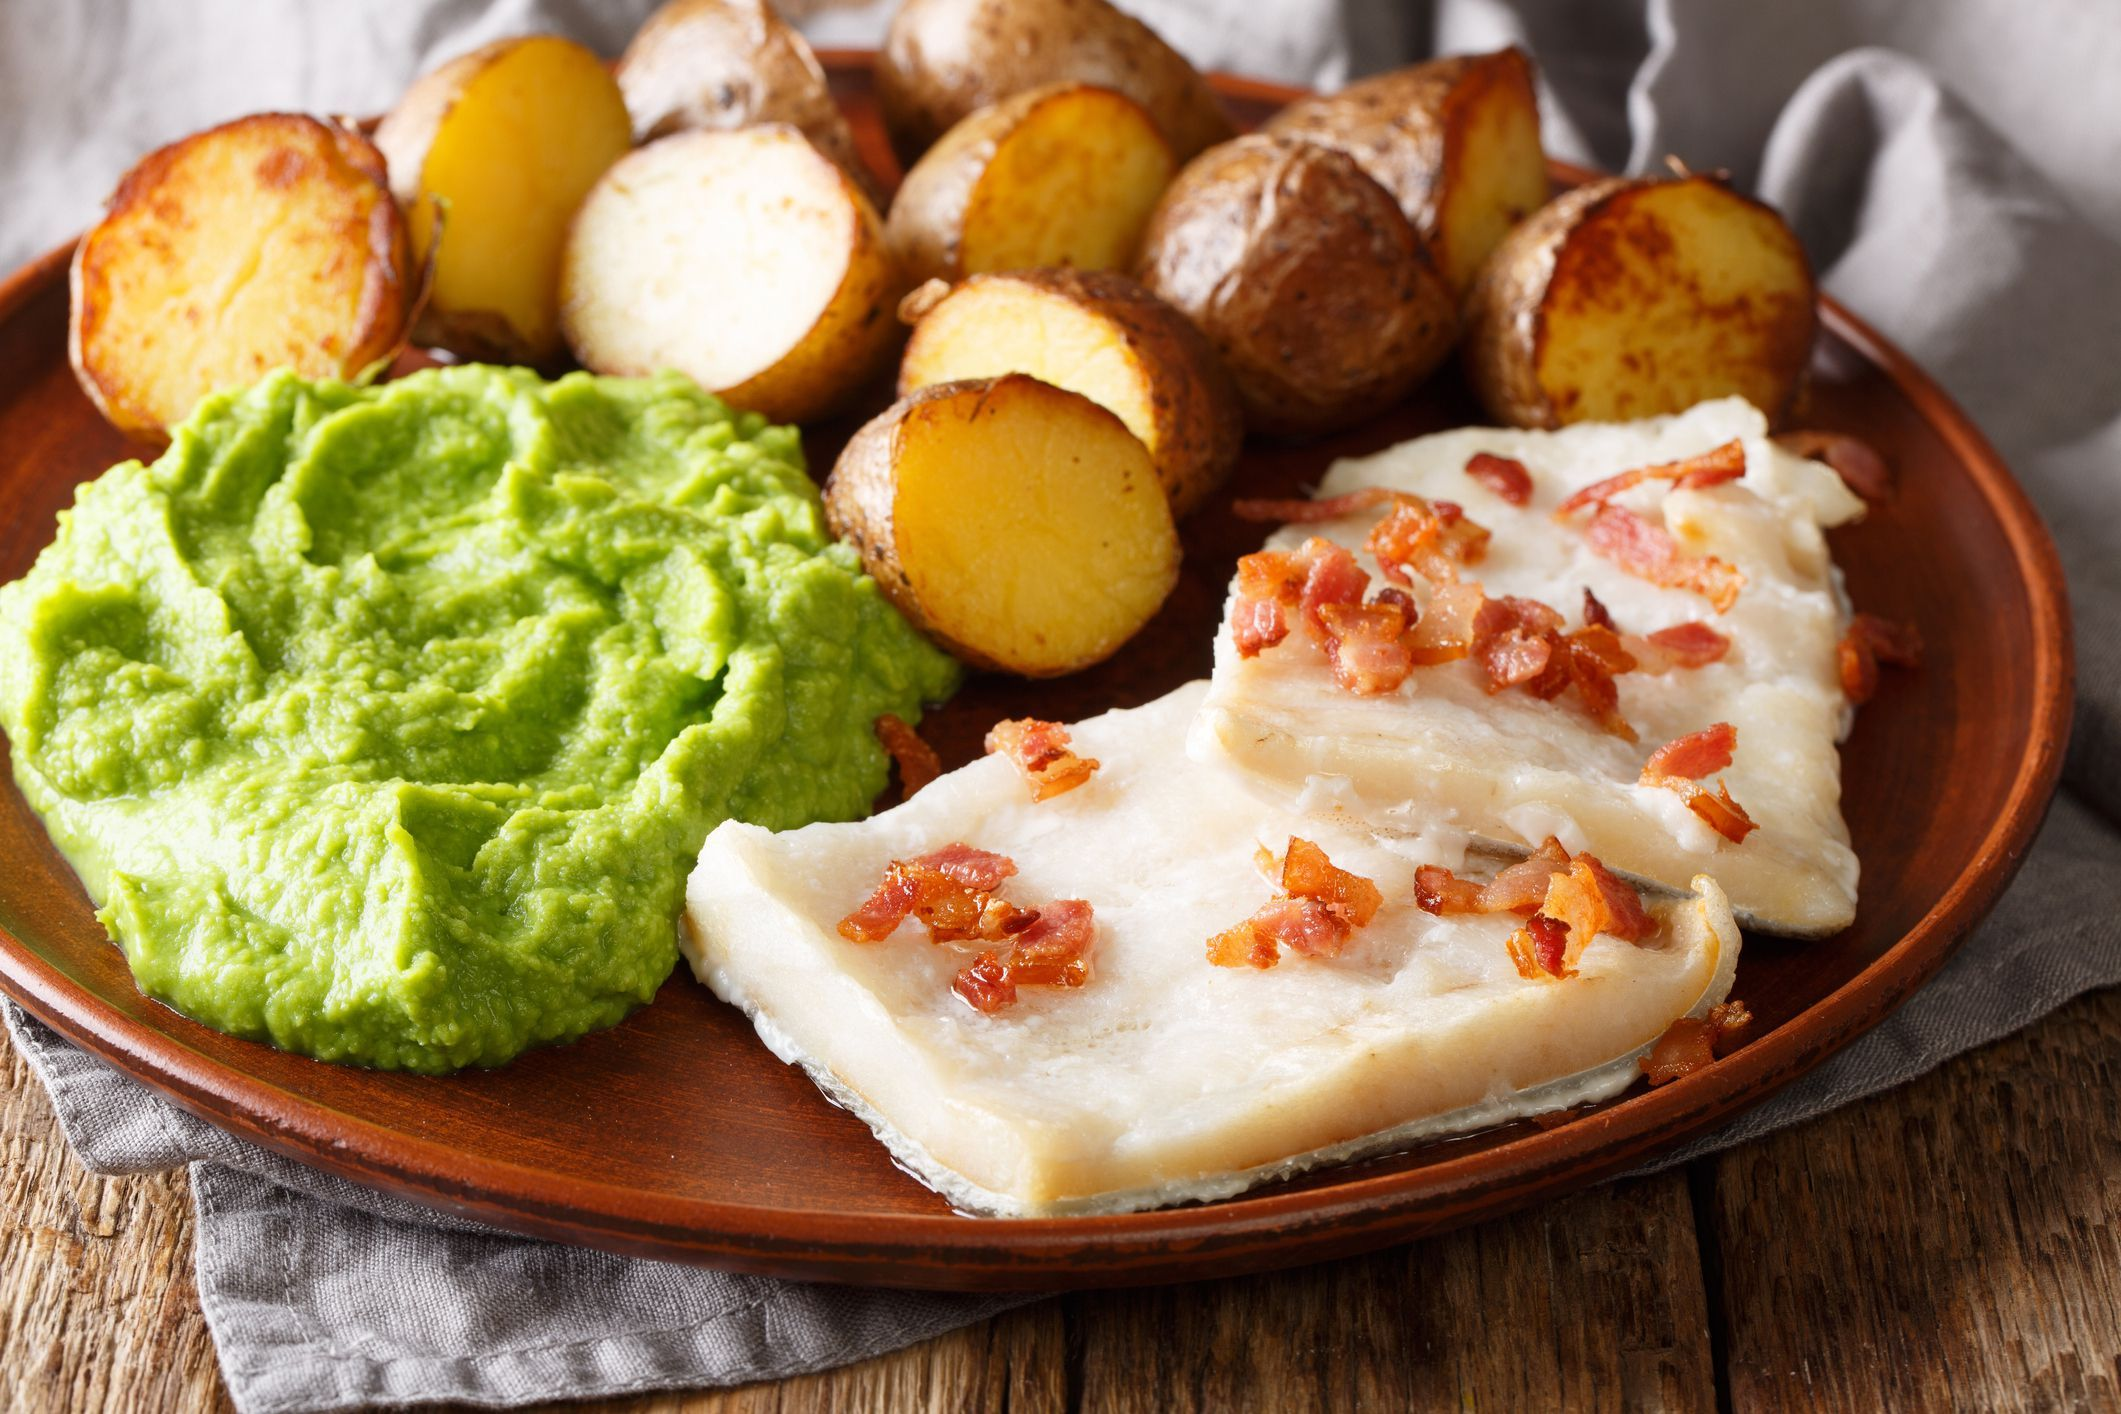 What Is The Scandinavian Food Lutefisk Scandinavian Food Food Norwegian Food